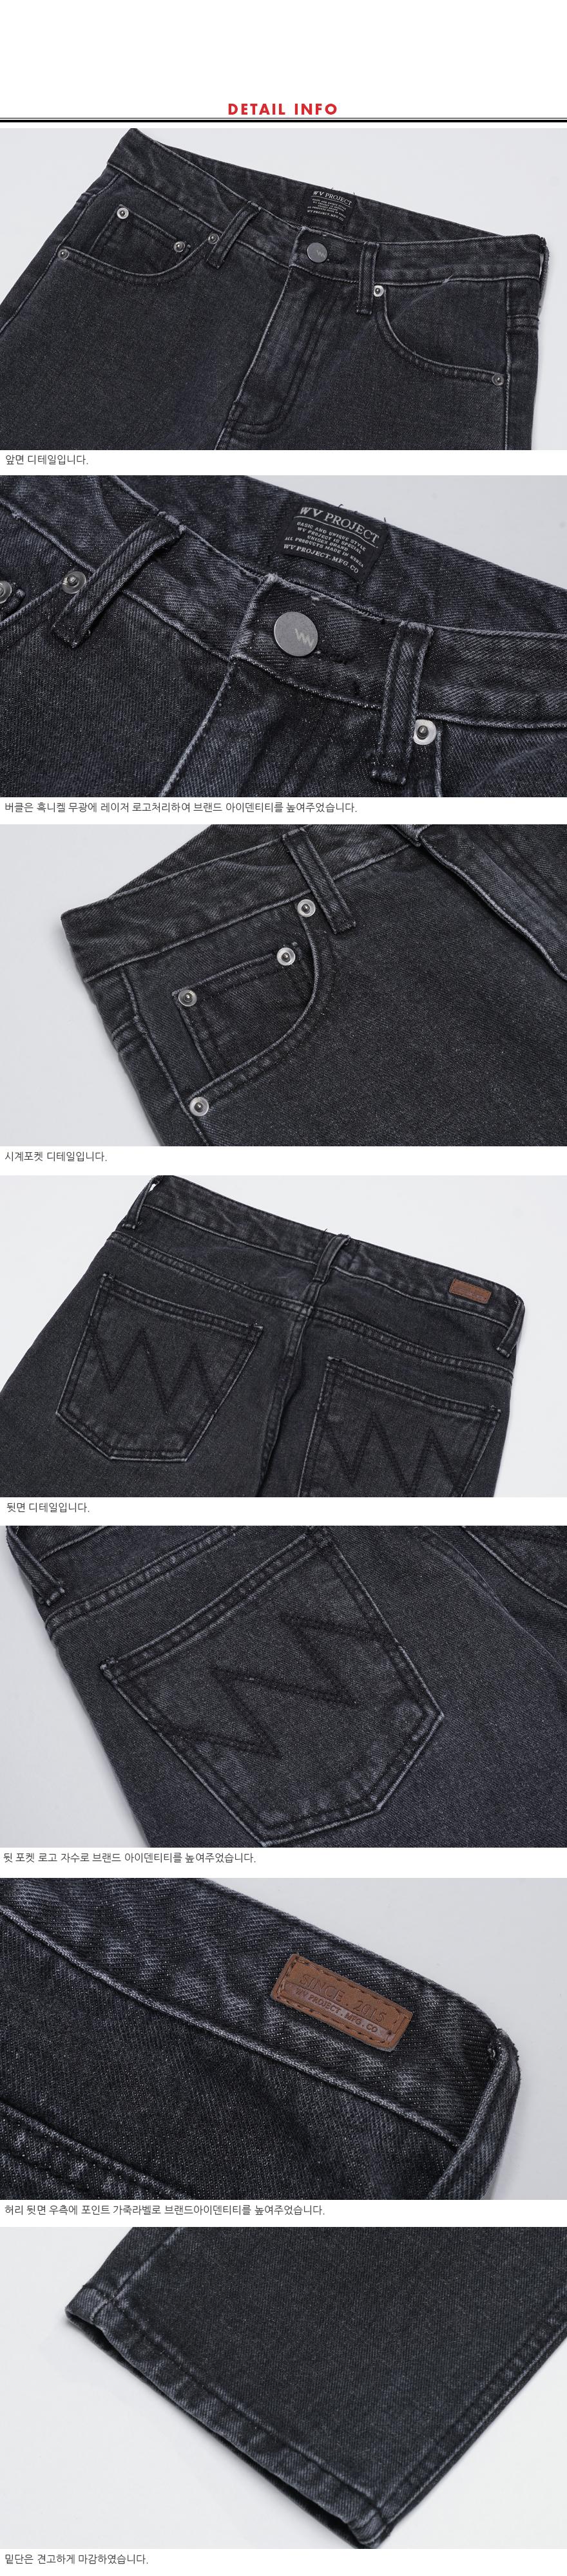 MJLP7298_detail_black.jpg